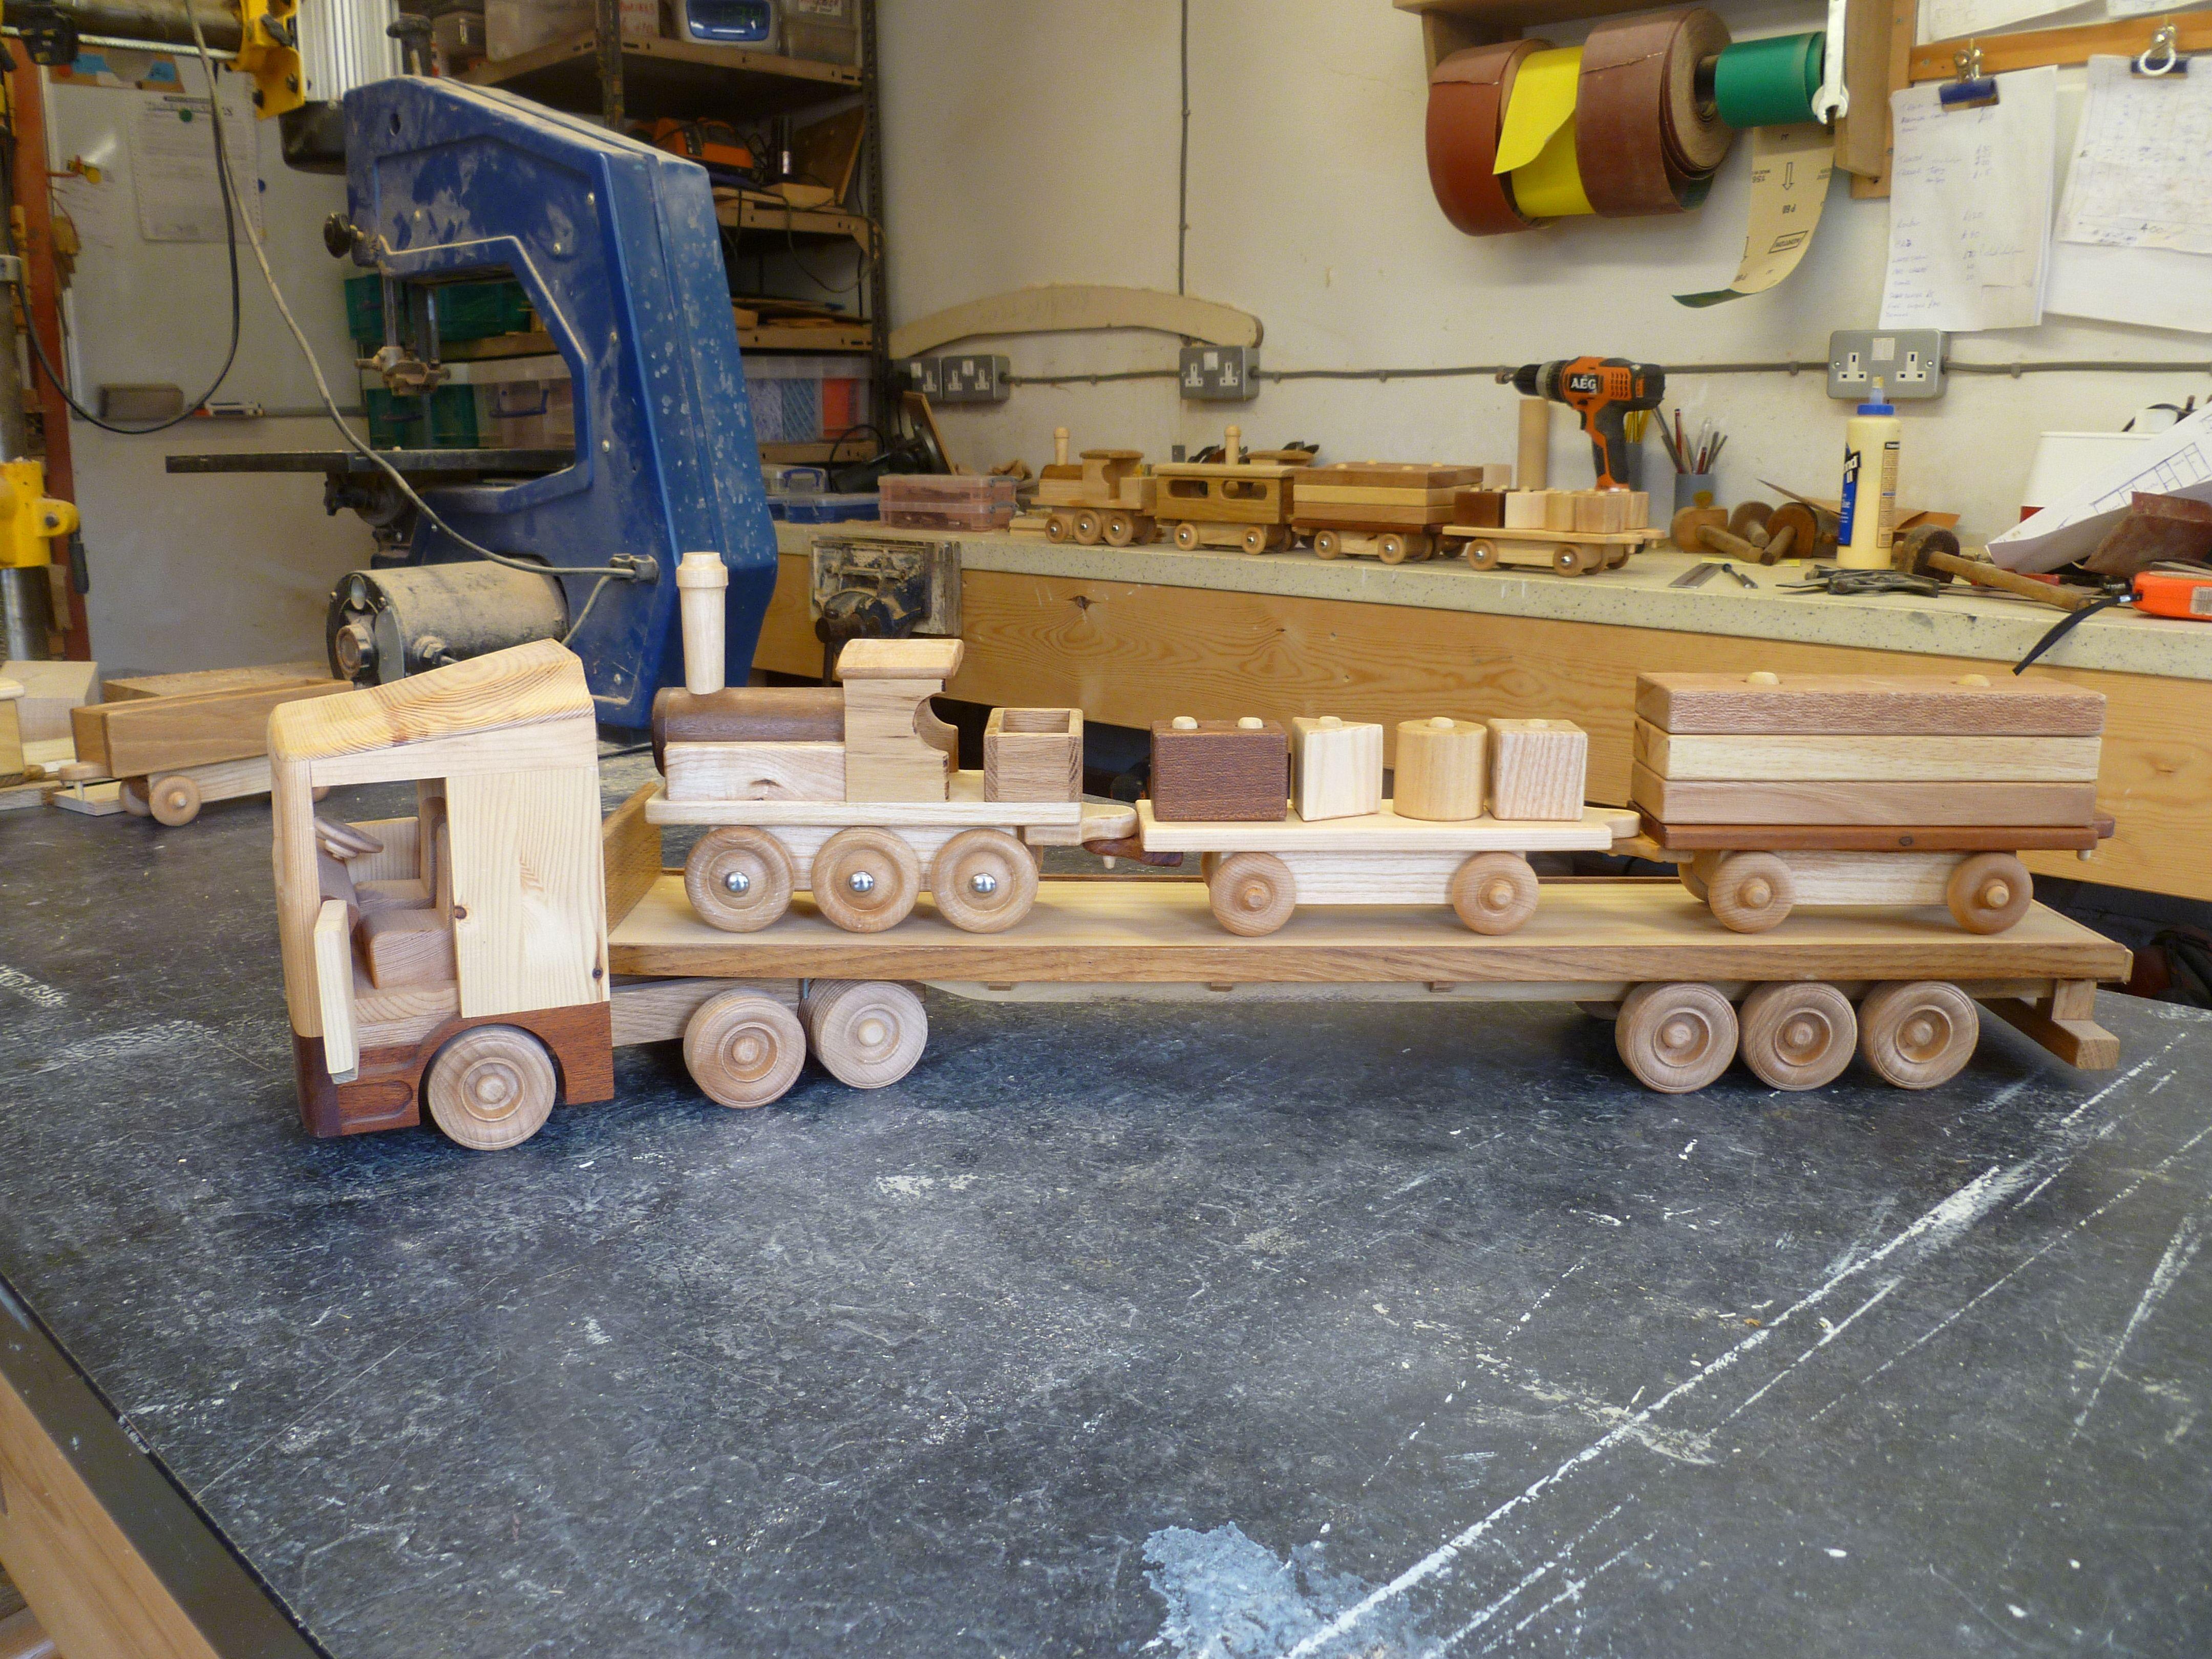 artic lorry wagon hgv or lgv grandad's wooden toys make